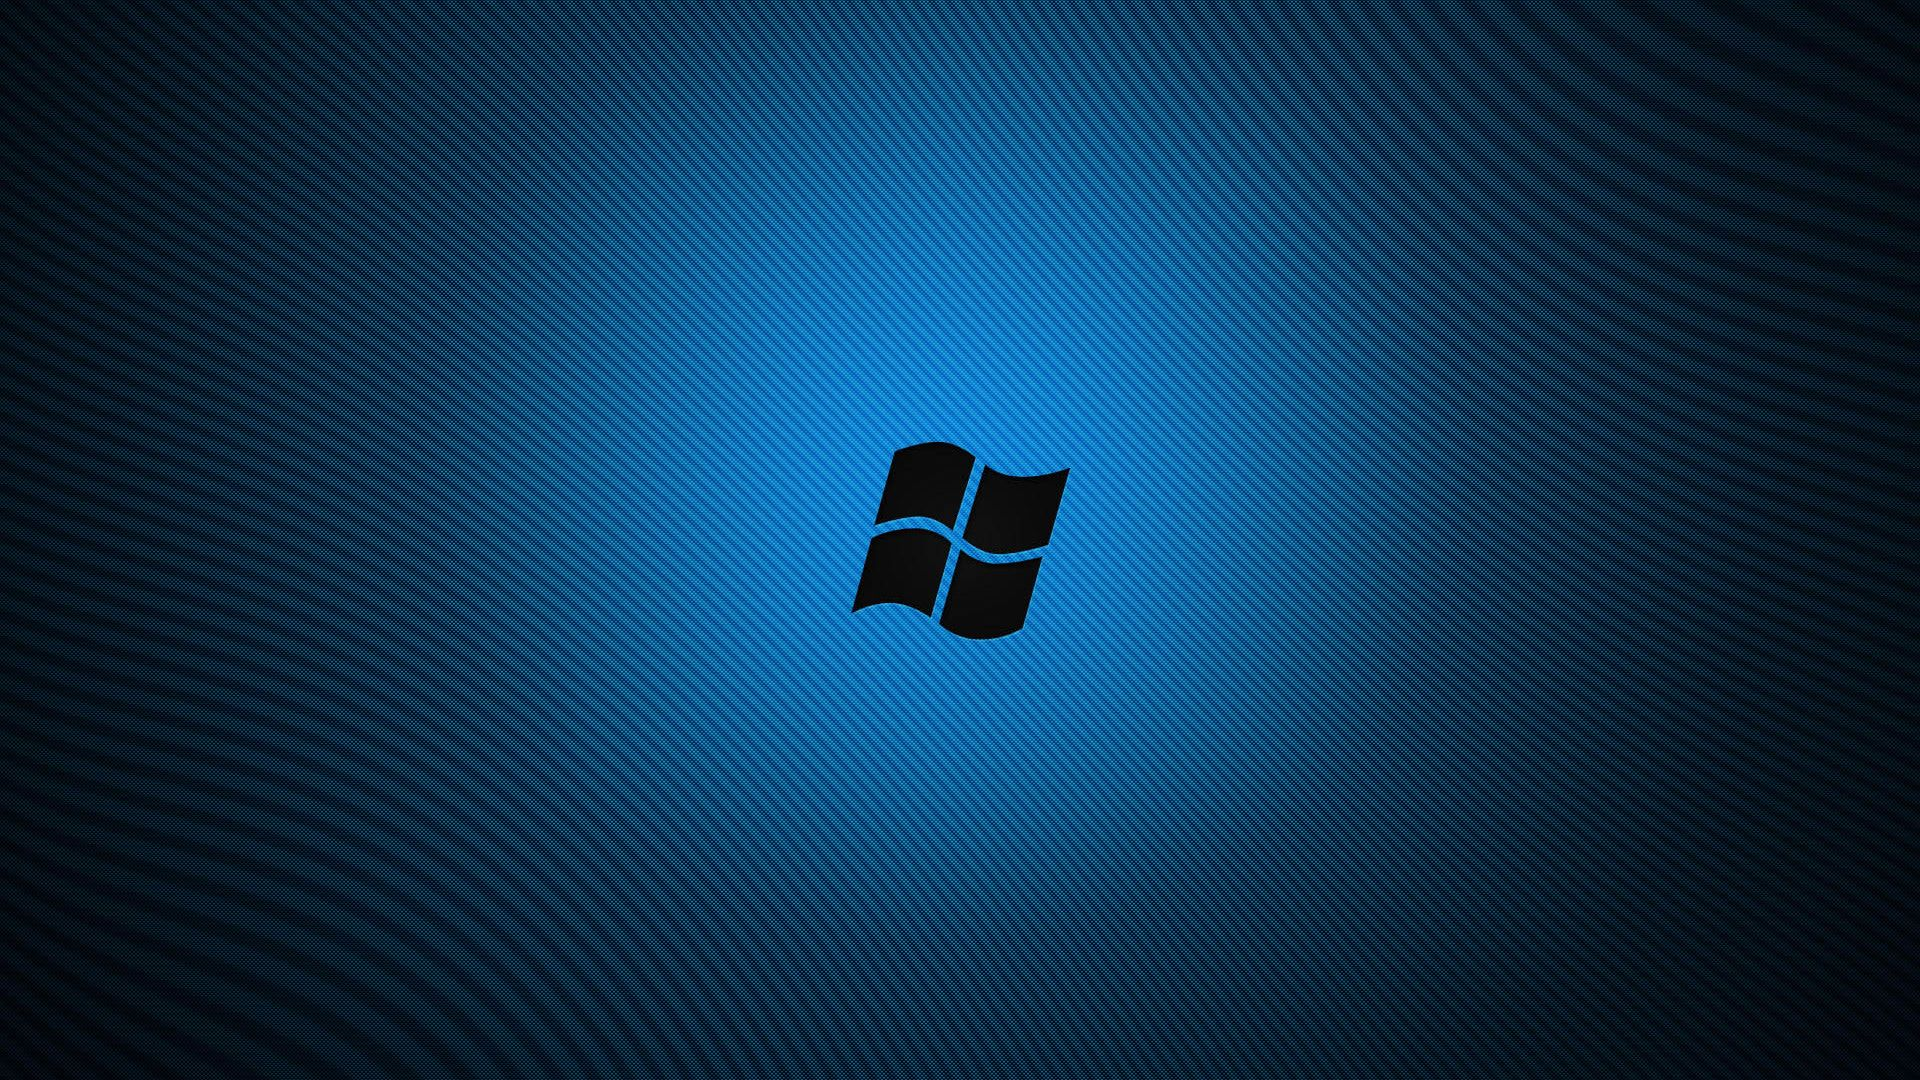 Set A Gif As Your Windows Desktop Wallpaper 1920 1080 Free Windows Desktop Backgrounds 46 Wallpapers Windows Wallpaper Blue Wallpapers 3d Desktop Wallpaper